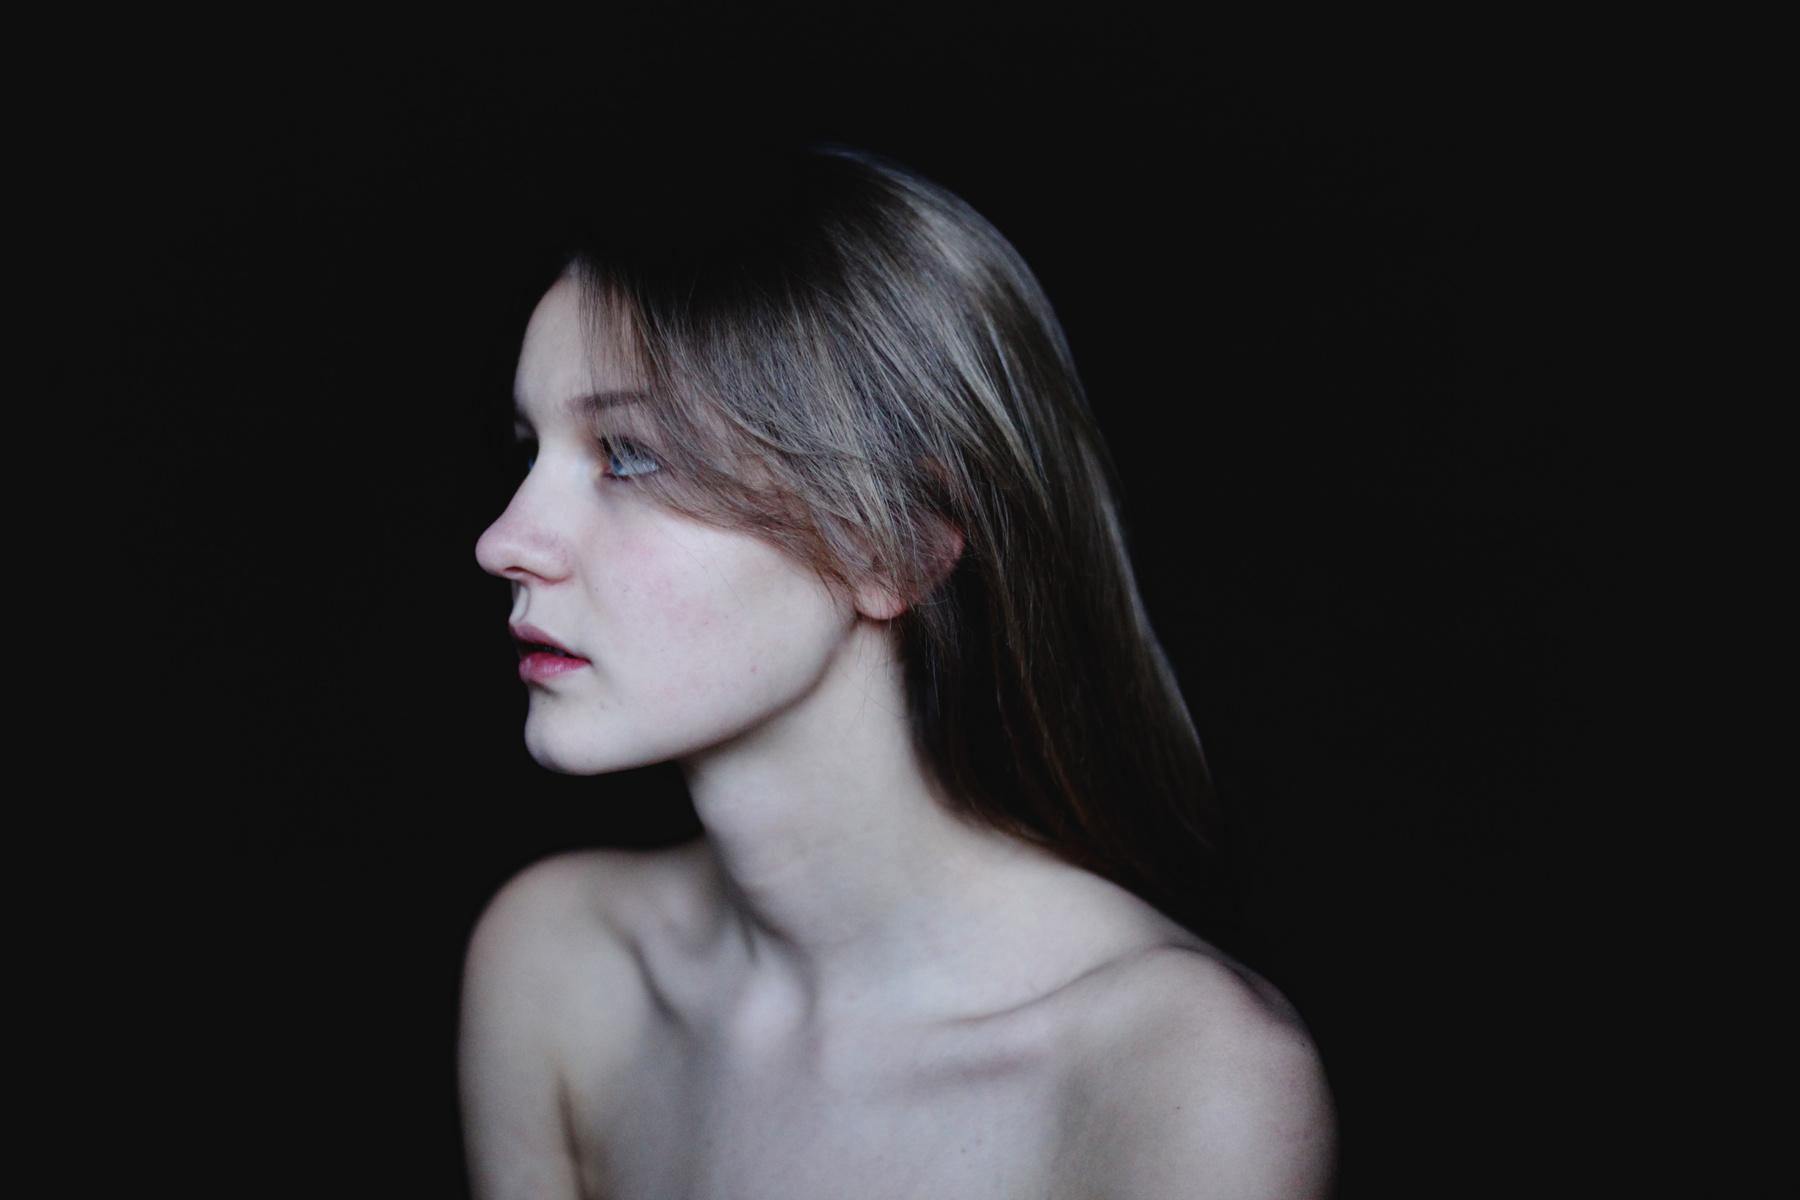 Clara_Nebeling-01.jpg